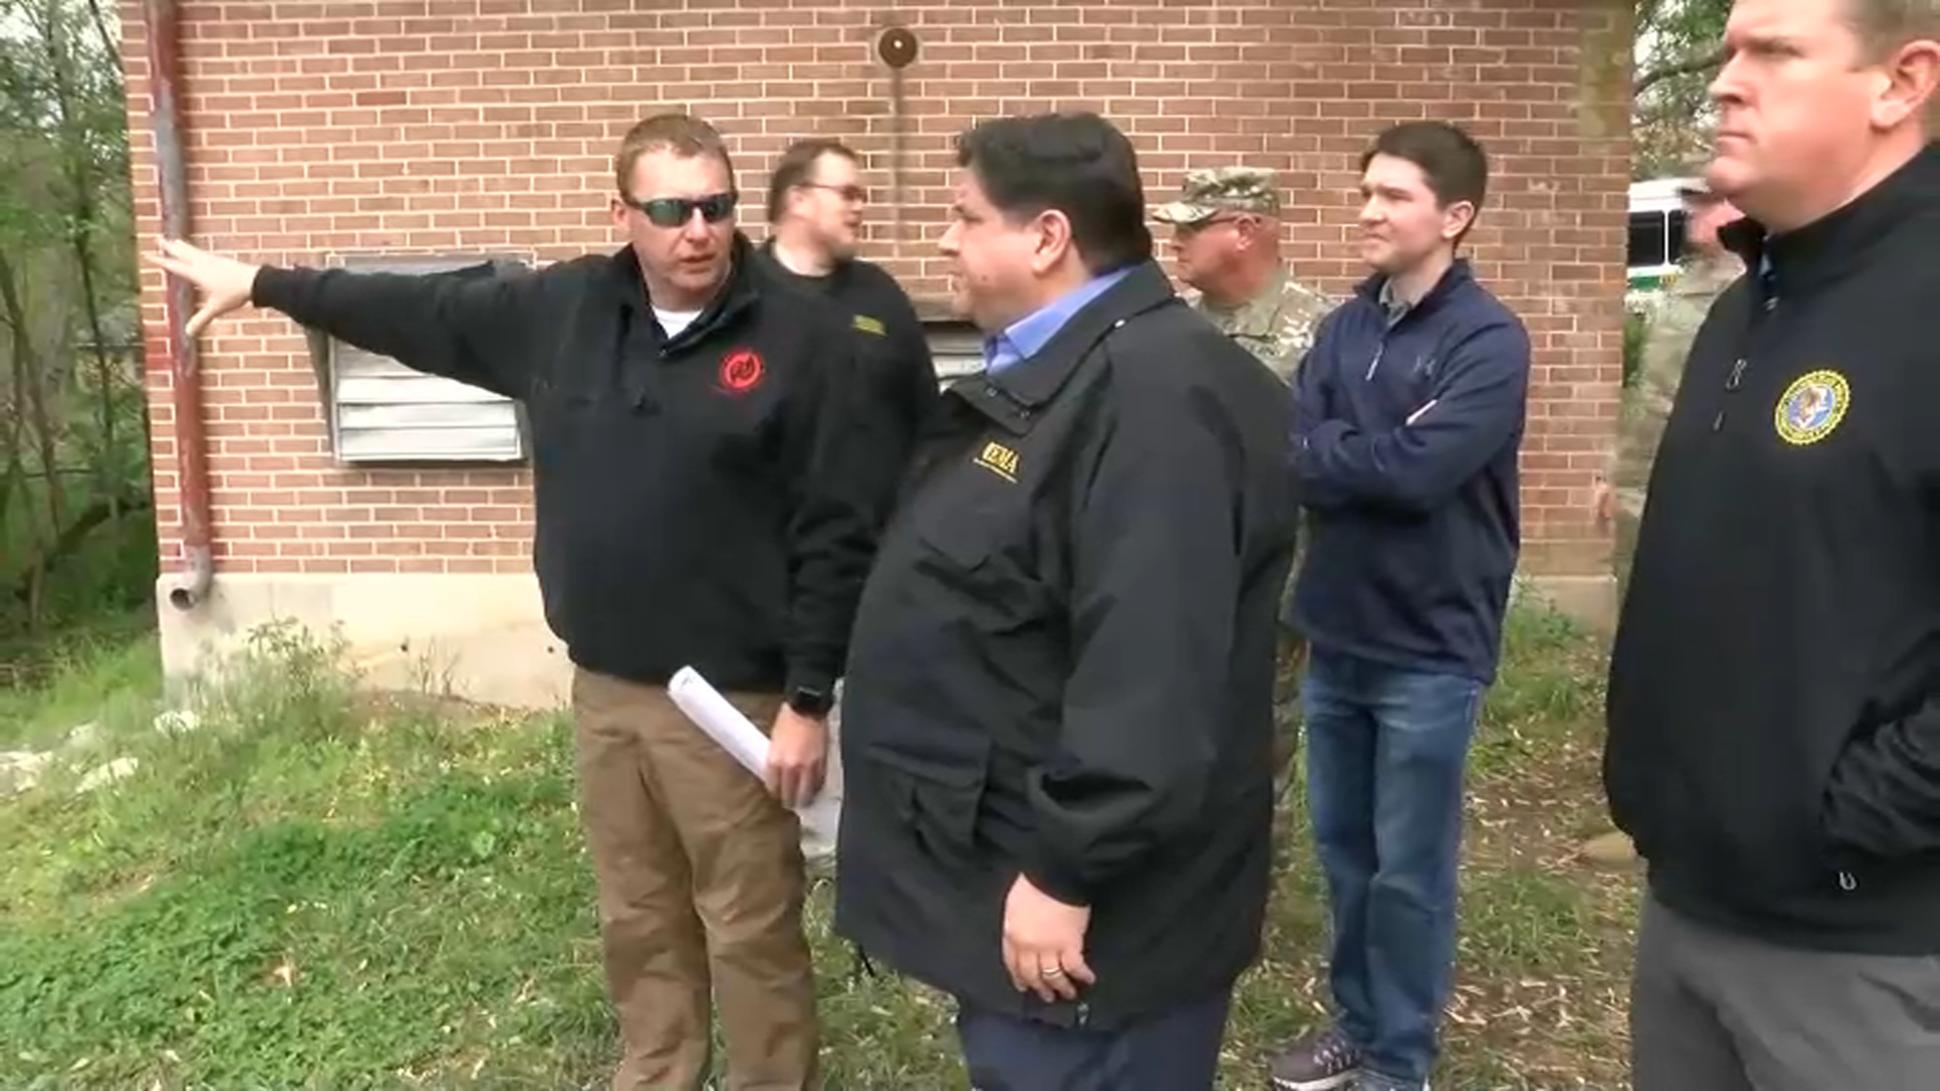 Gubernator Pritzker odwiedził tereny Illinois, które ucierpiały na skutek podtopień